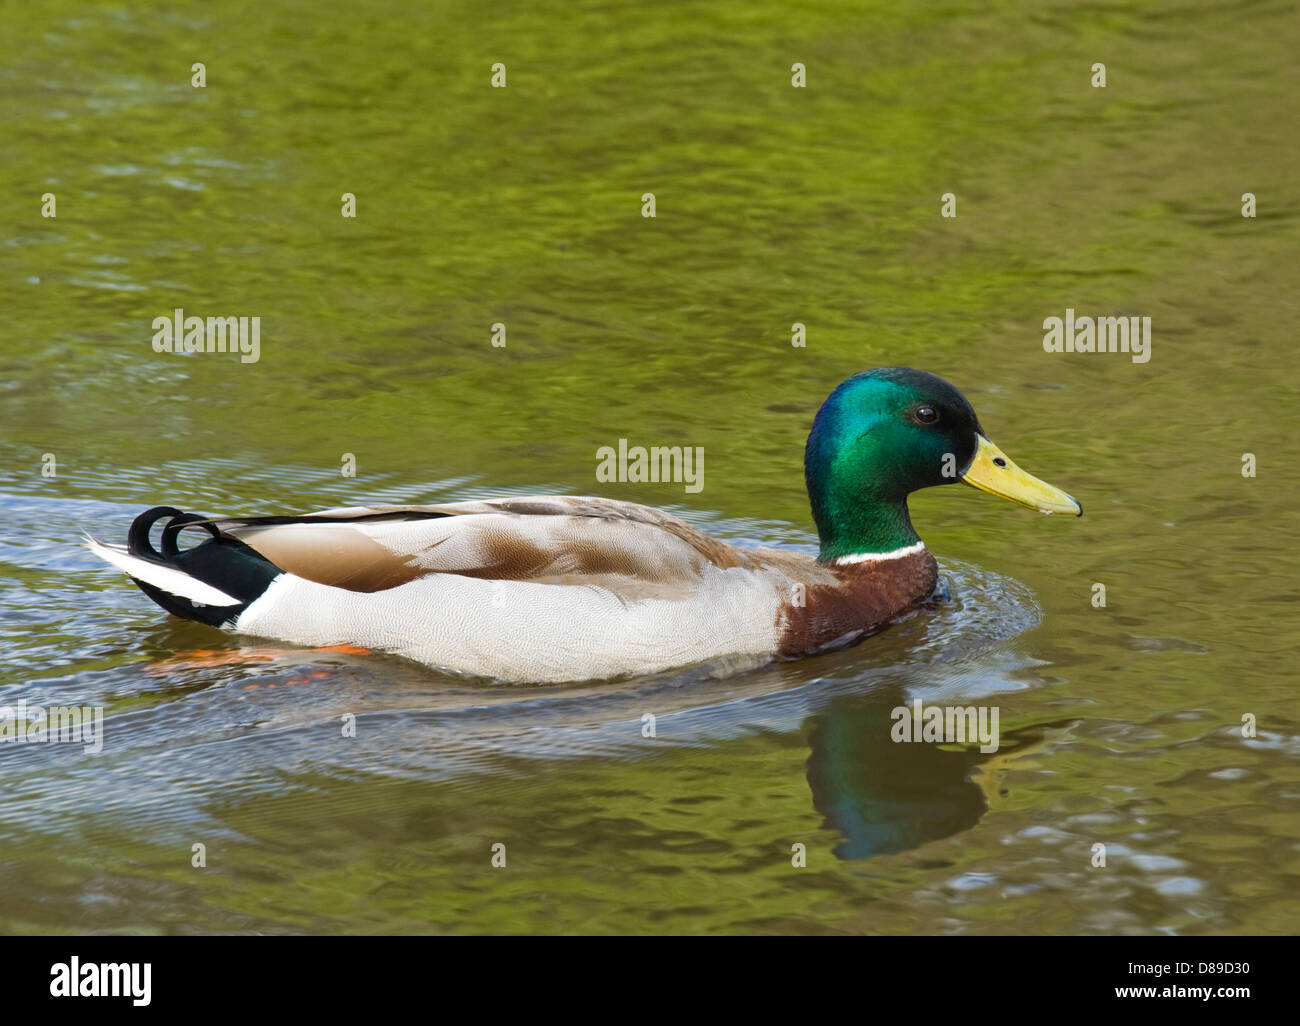 Male mallard, Anus platyrhynchos. - Stock Image